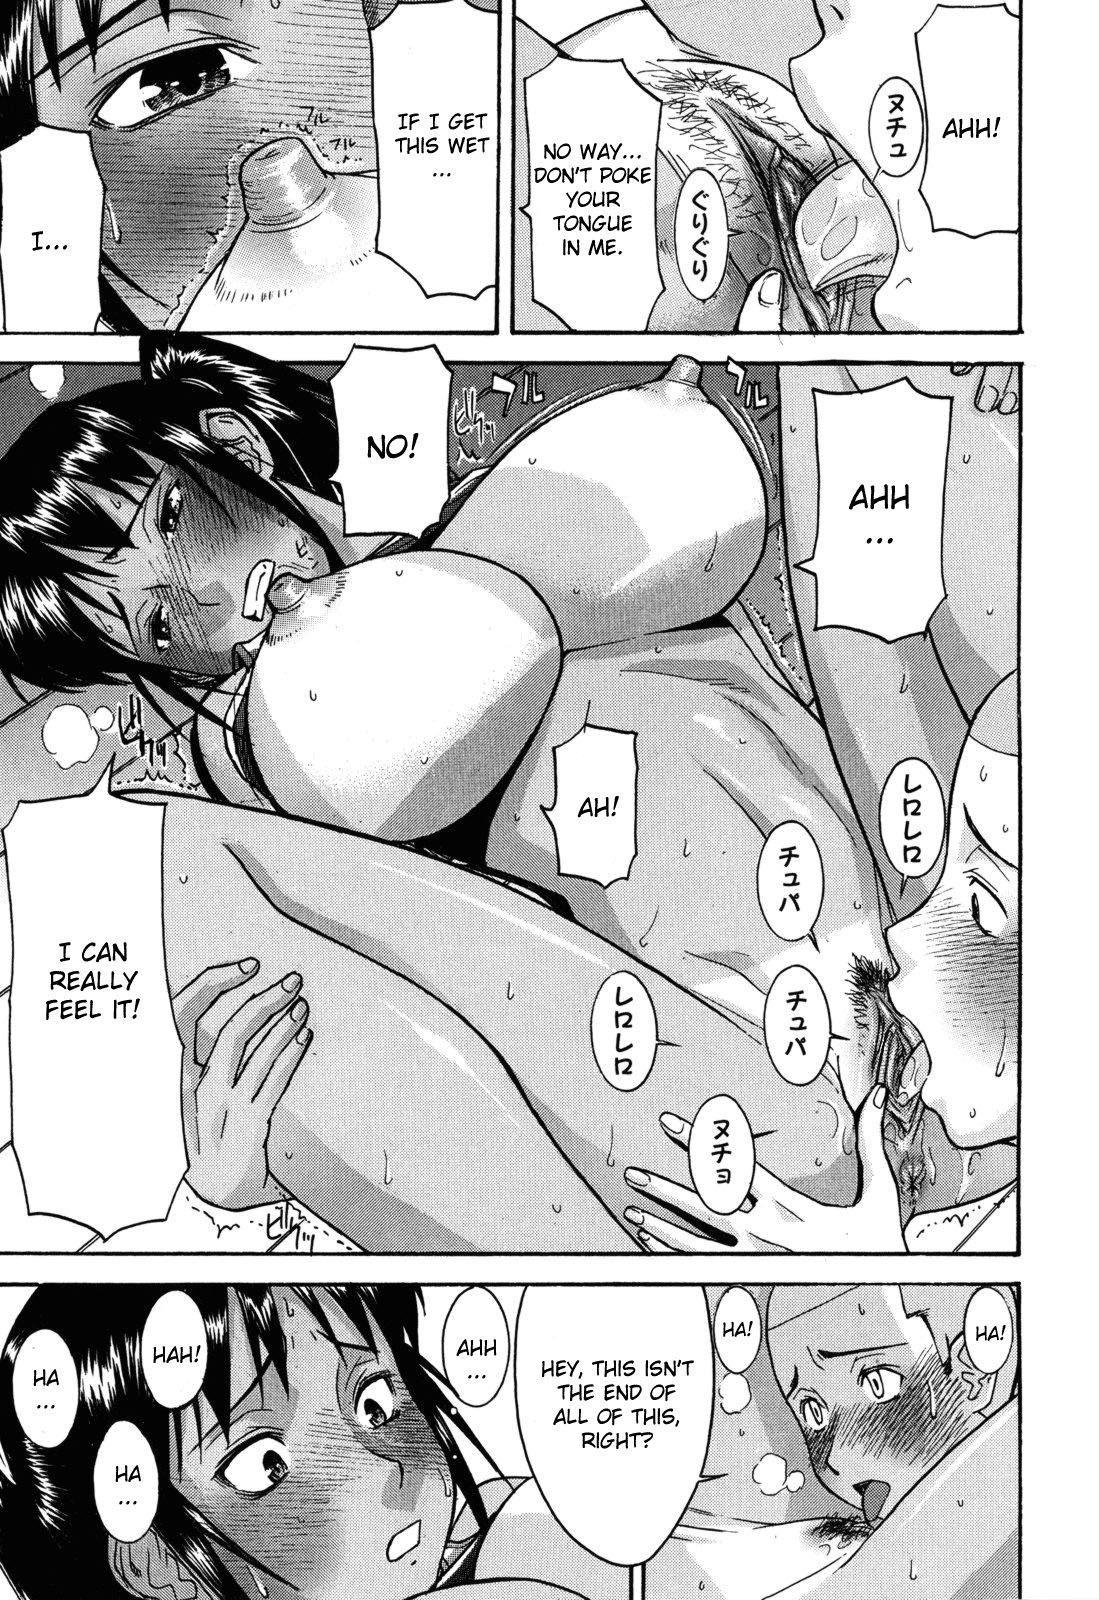 [Inomaru] 8-gatsu 31-nichi | August 31st (Camellia) [English] [CGrascal] [Decensored] 12